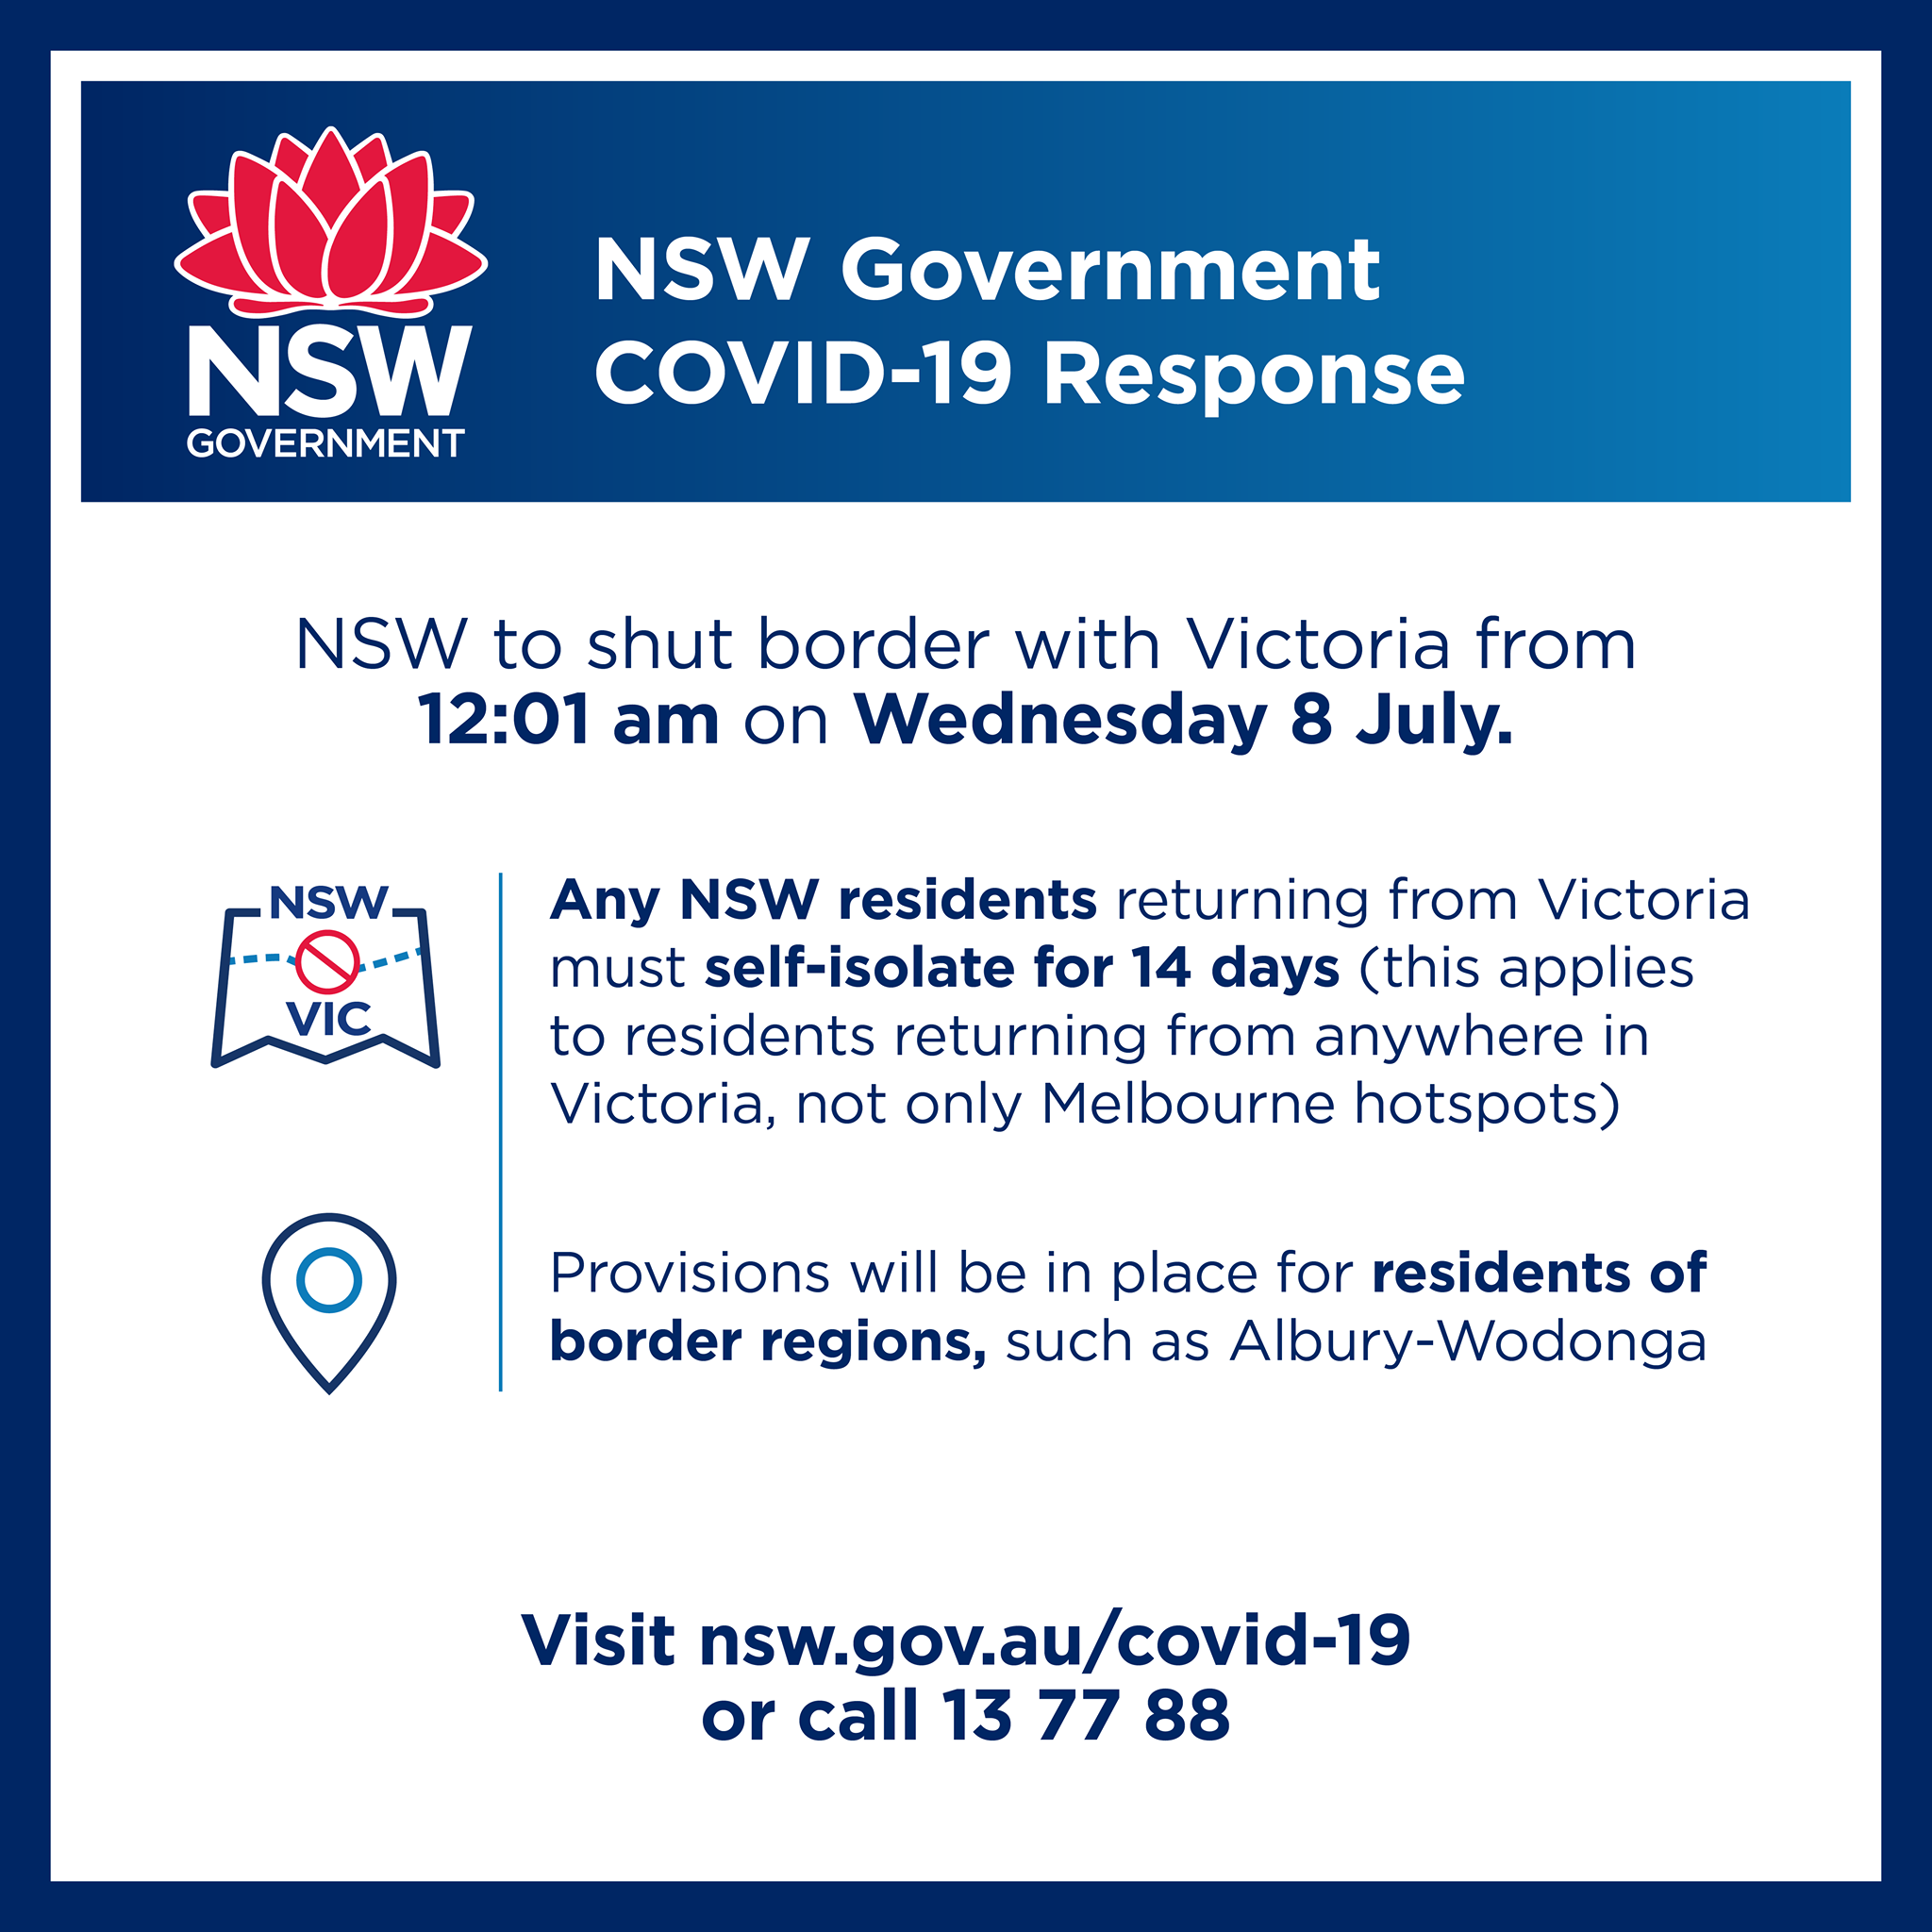 NSW Government COVID-19 Response